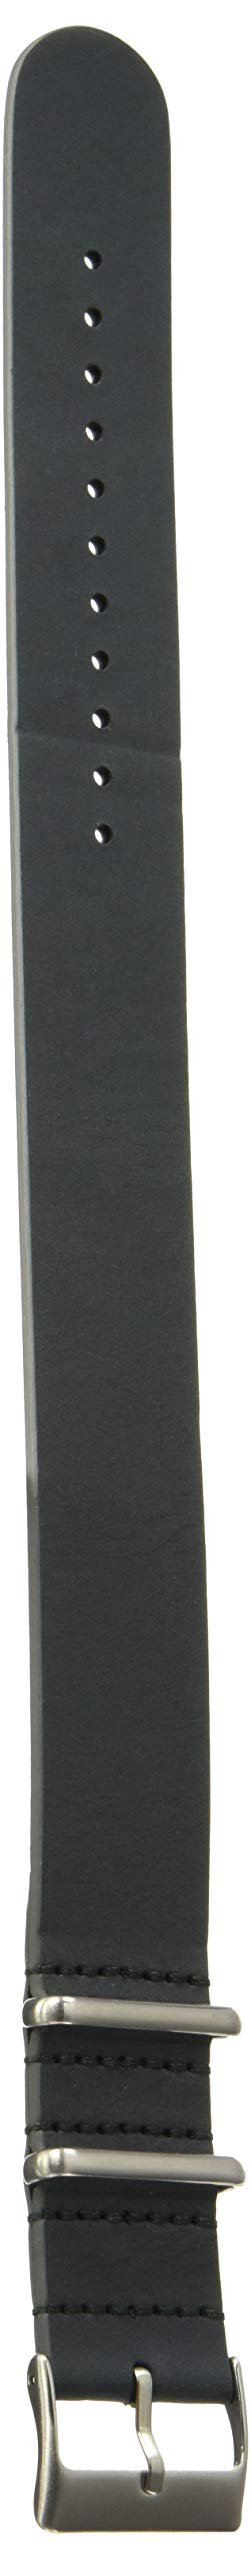 Kerbholz-Unisex-Erwachsene-Leder-Uhrenarmband-WATWHEI5452